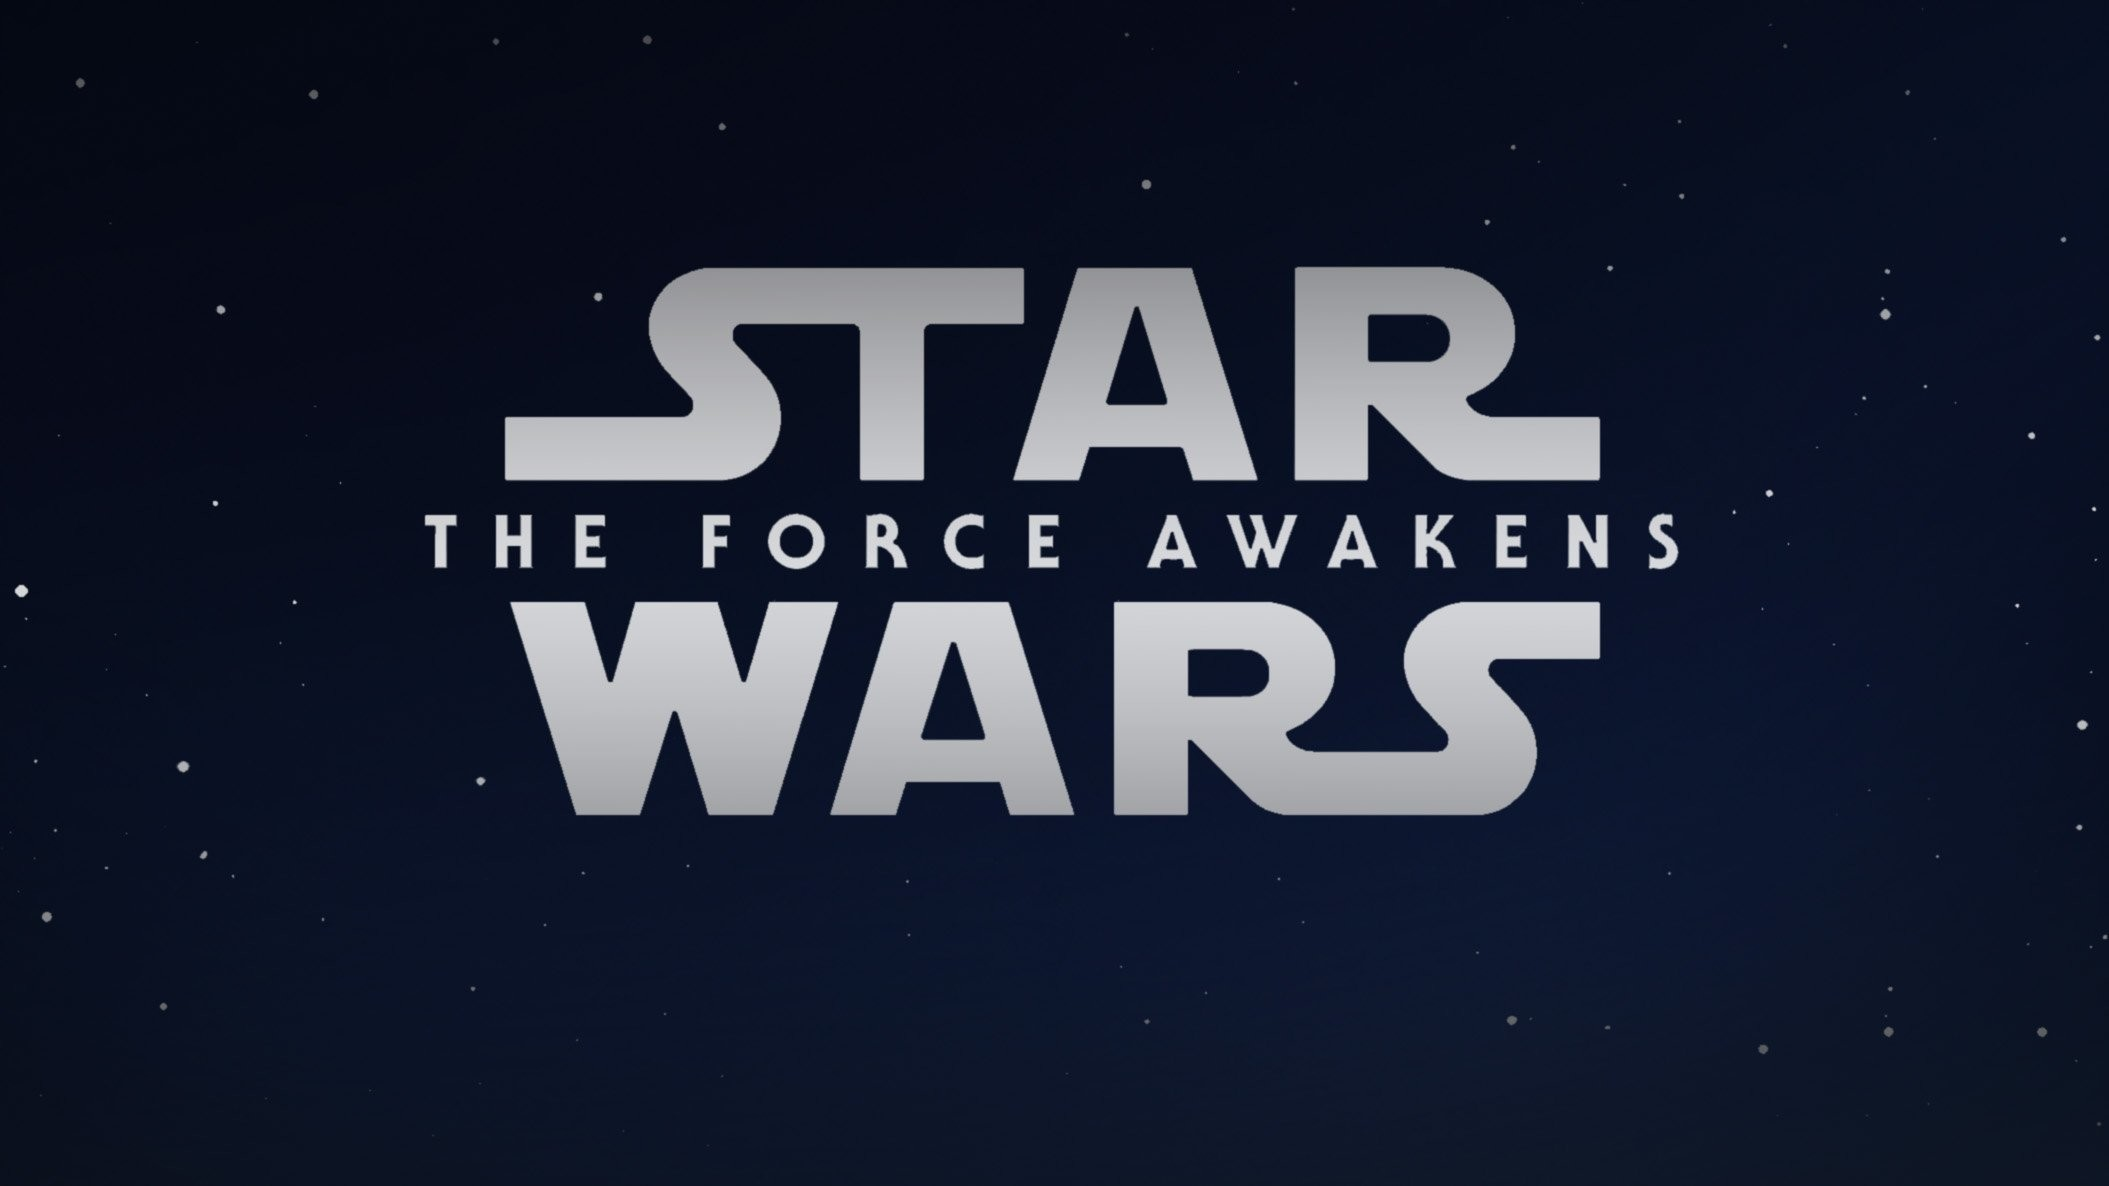 Star Wars Logo Wallpaper ·① WallpaperTag